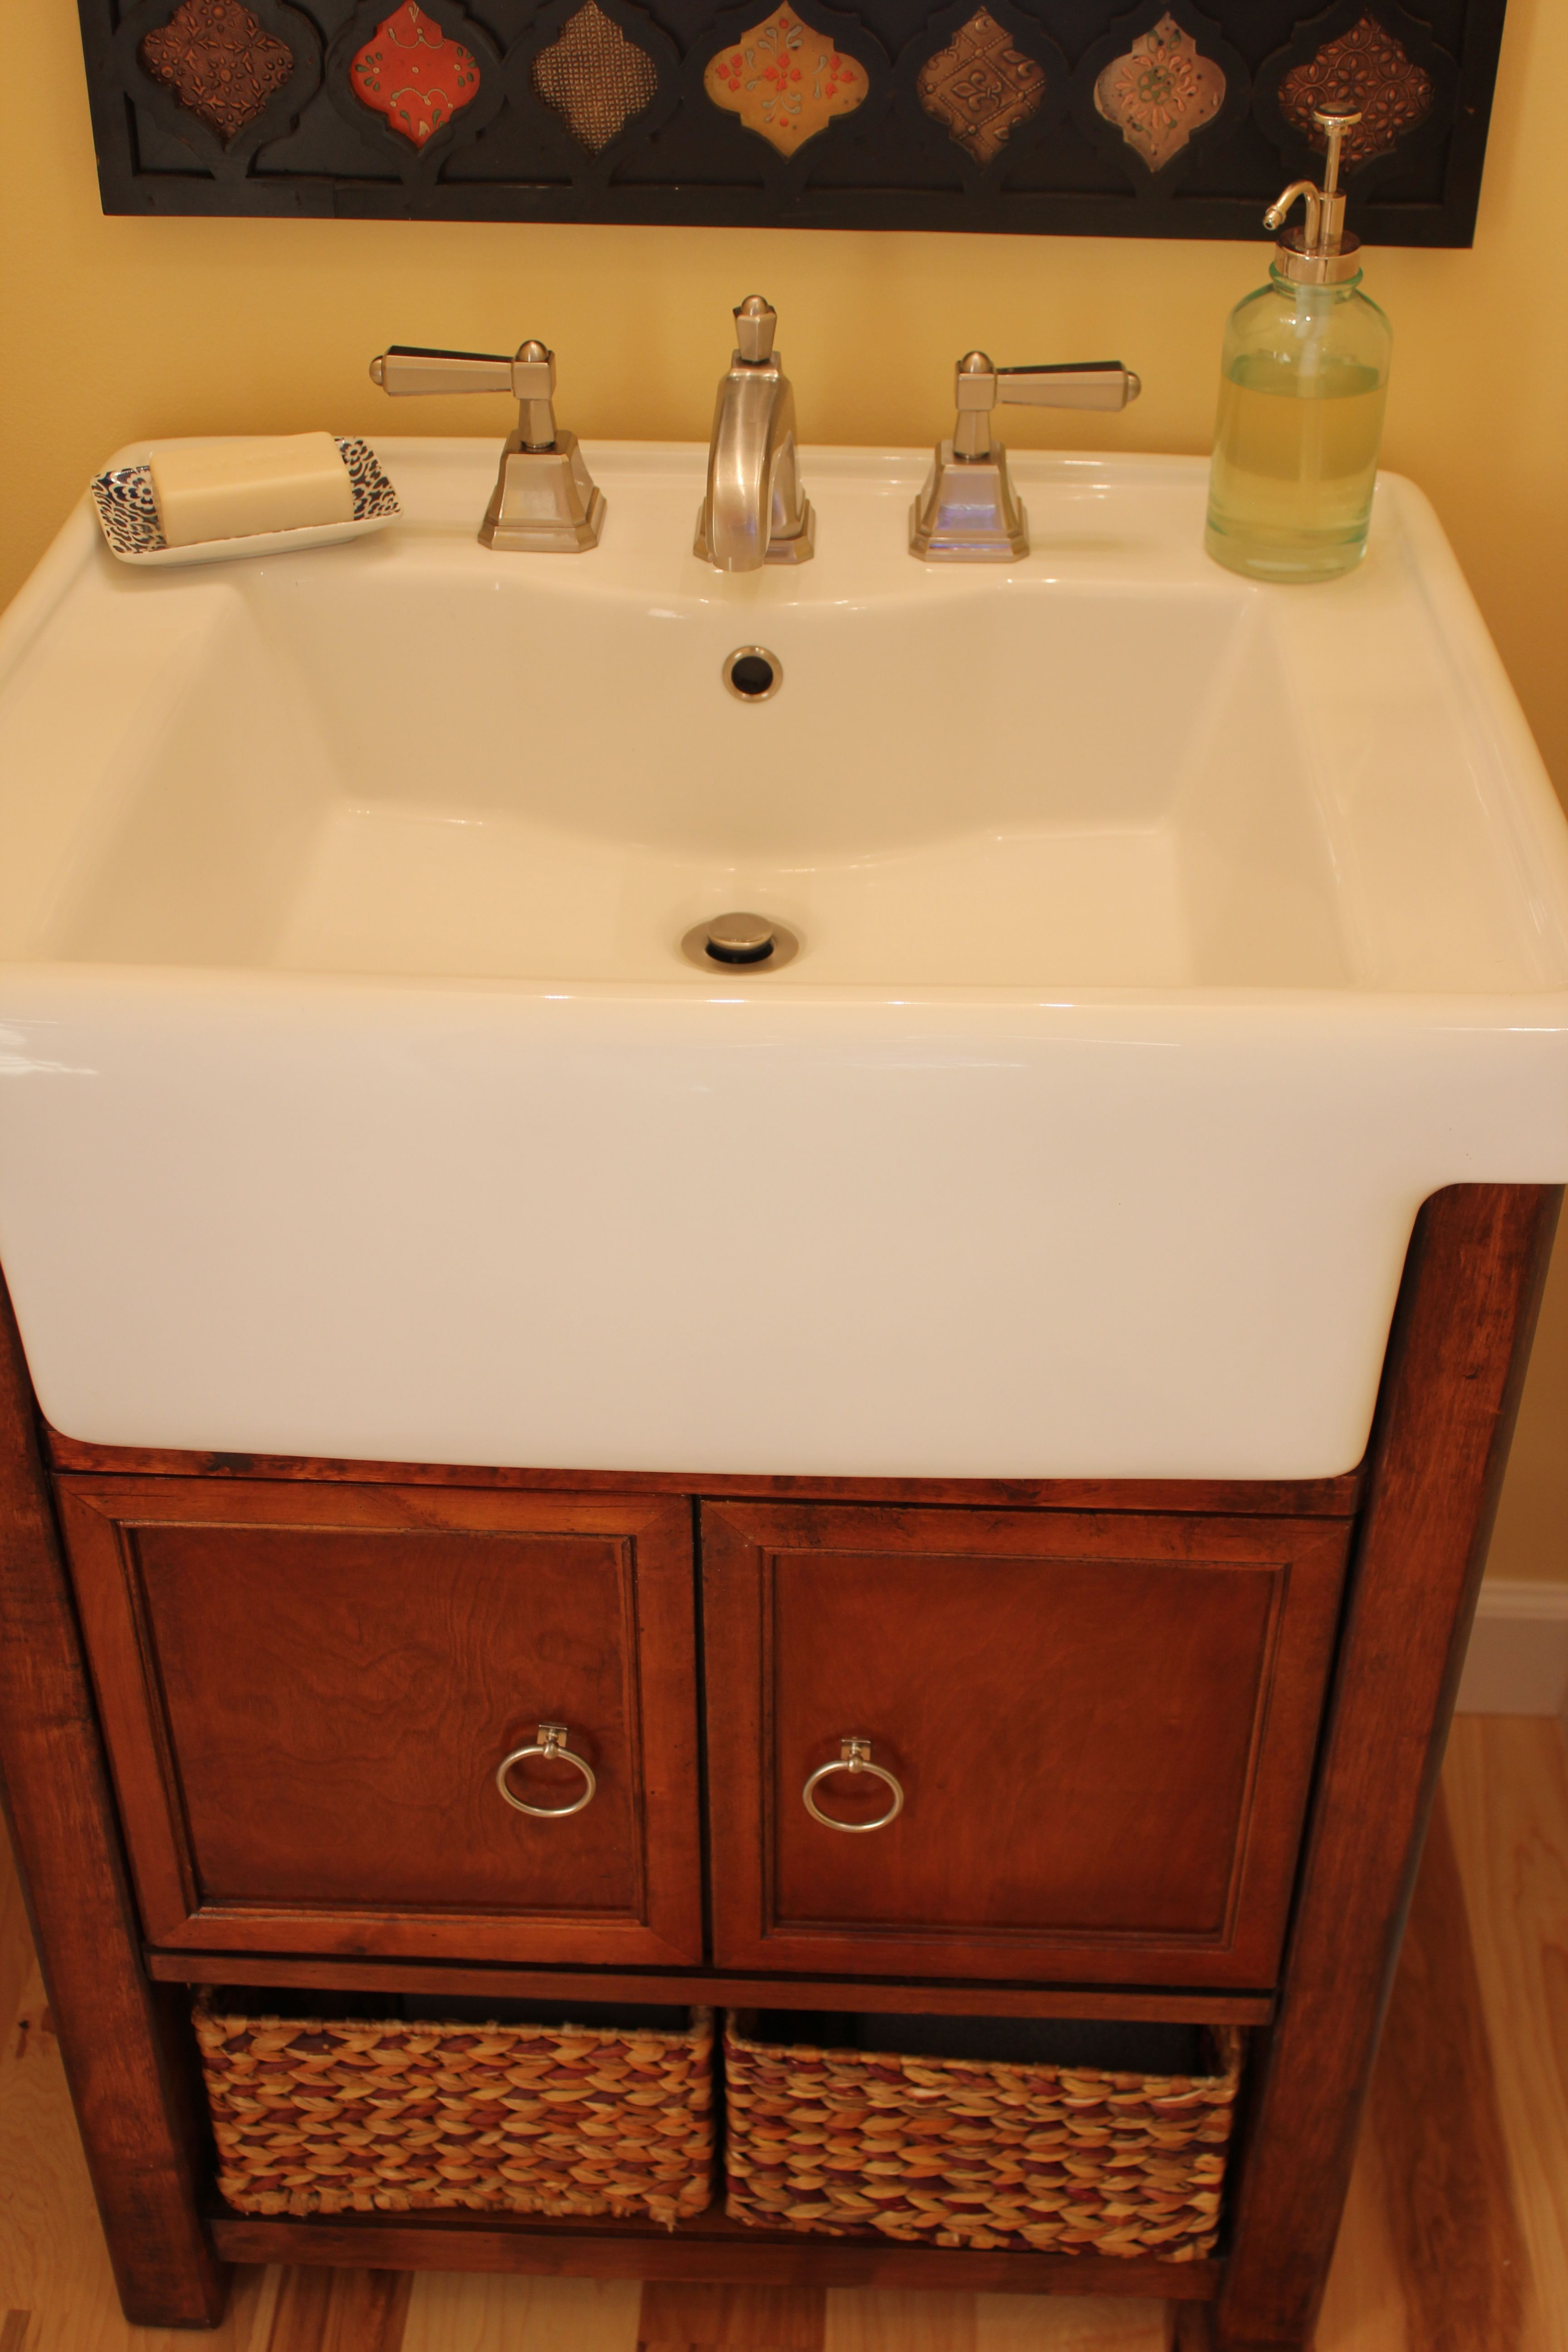 Farm Sink from Lowes Farm sink, Home upgrades, Bathroom